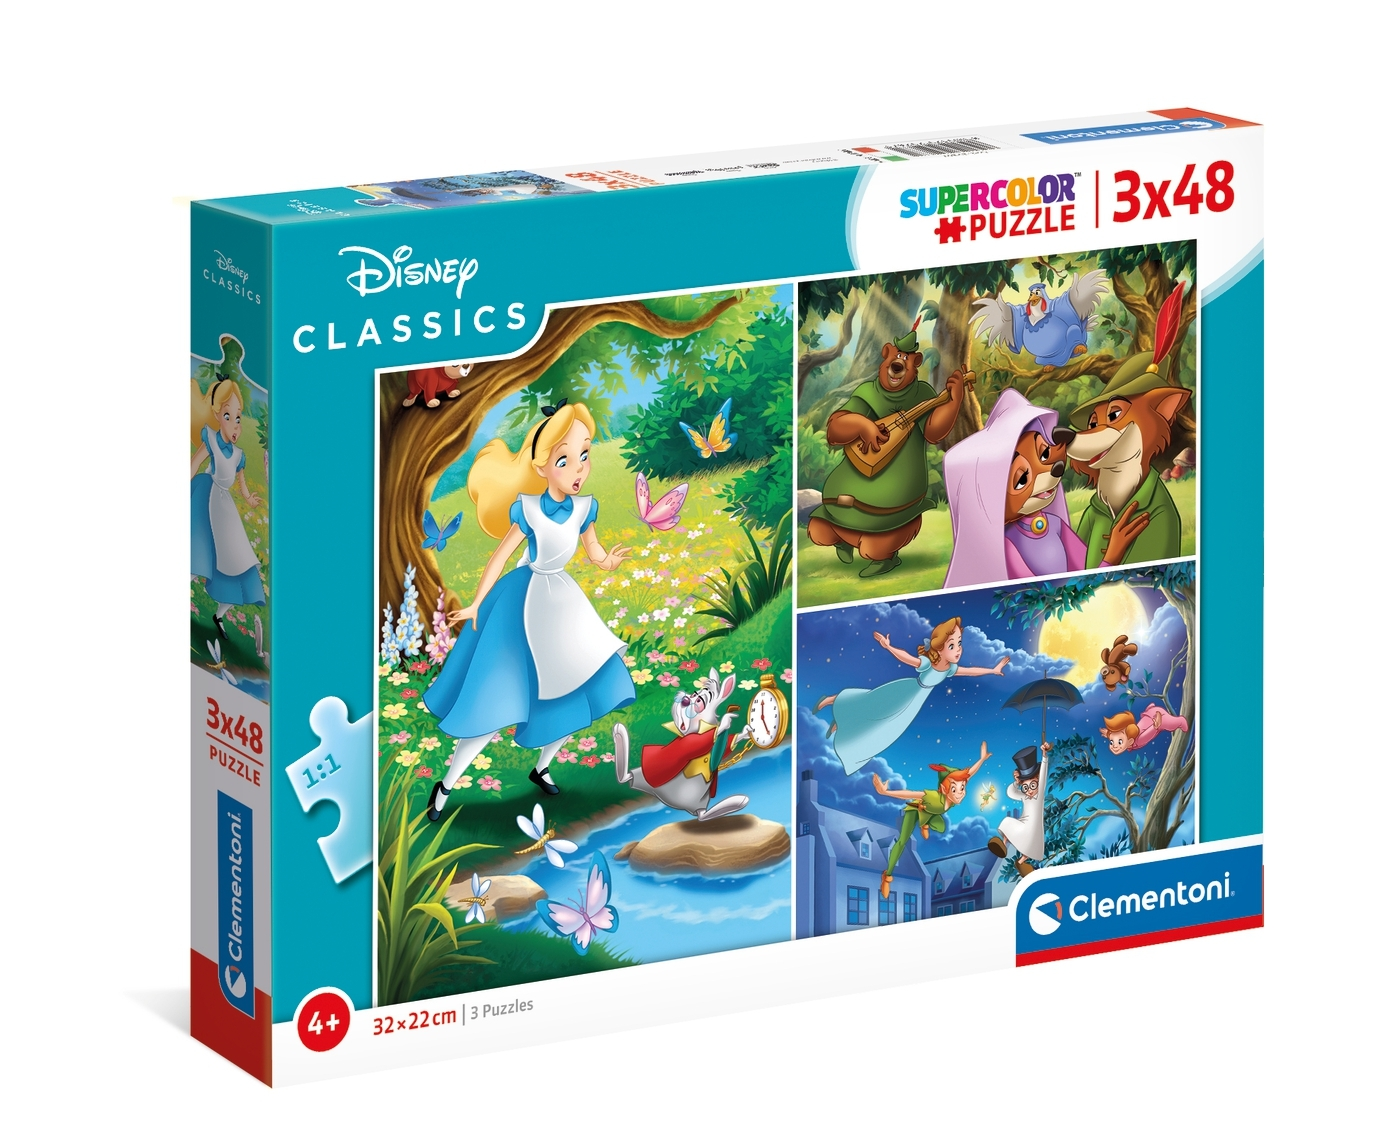 Puzzle SuperColor 3x48: Disney Classic (25267)